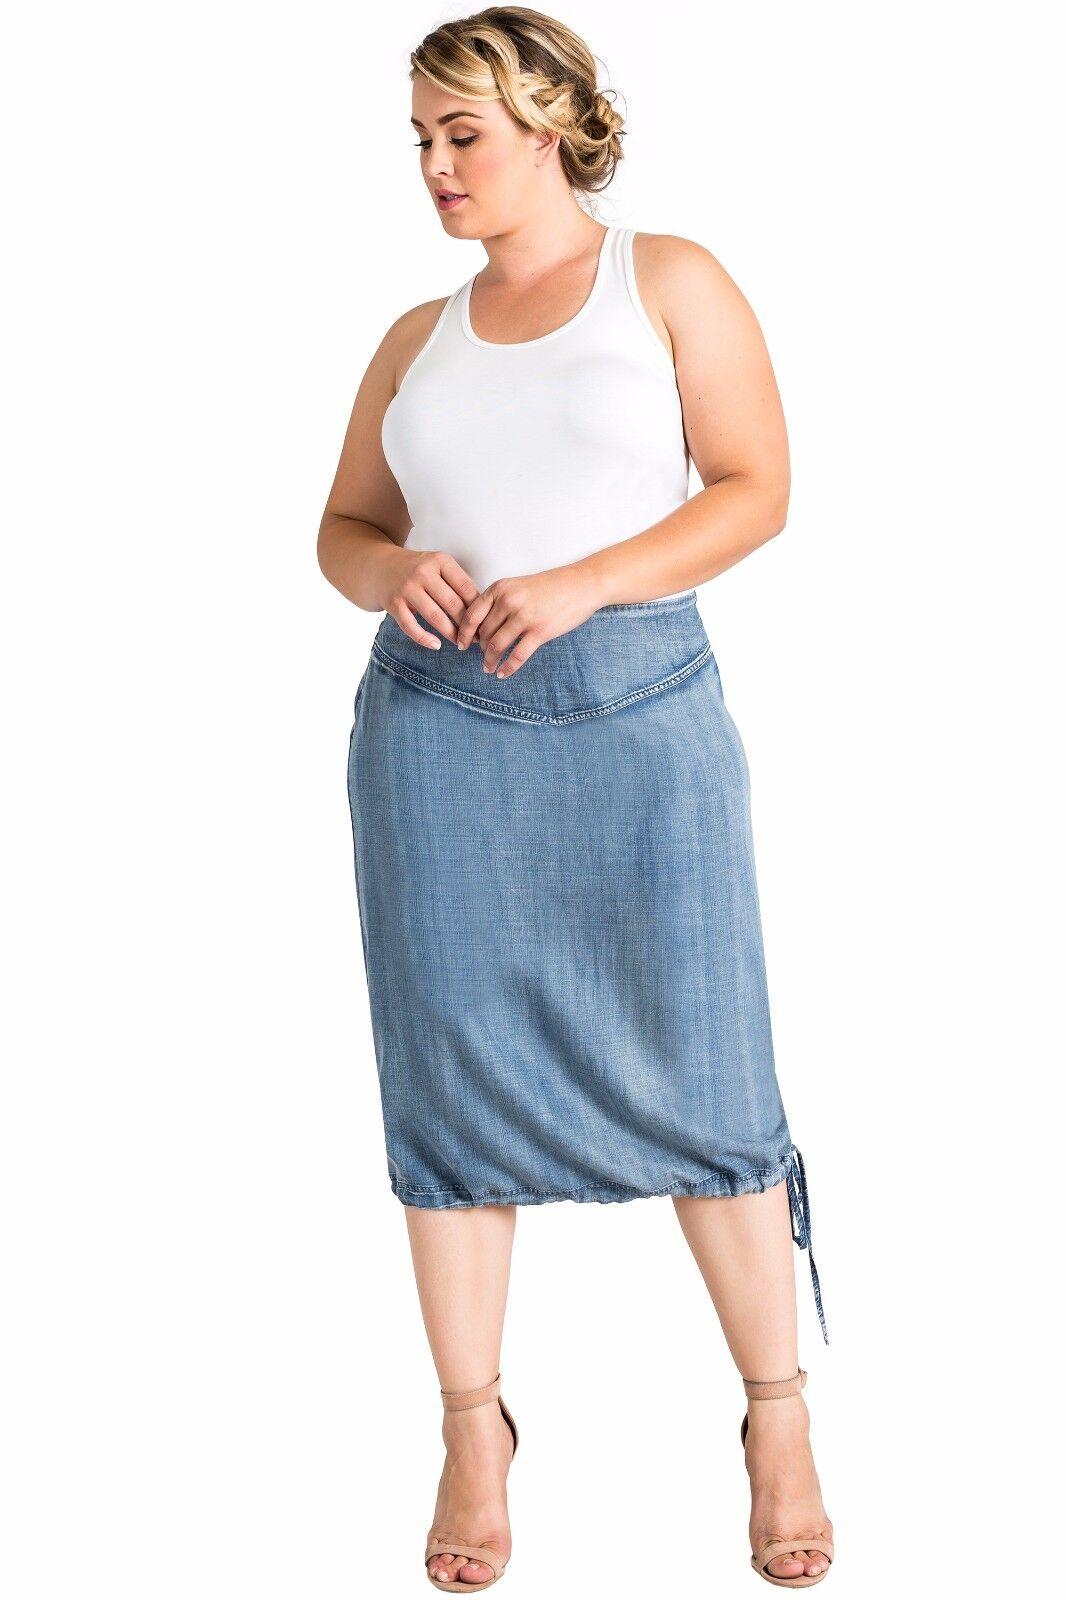 73a199ae36b Standards Standards Standards & Practices Plus Size Modern Women's Denim  Tencel Adjustable Hem Skirt 817f32